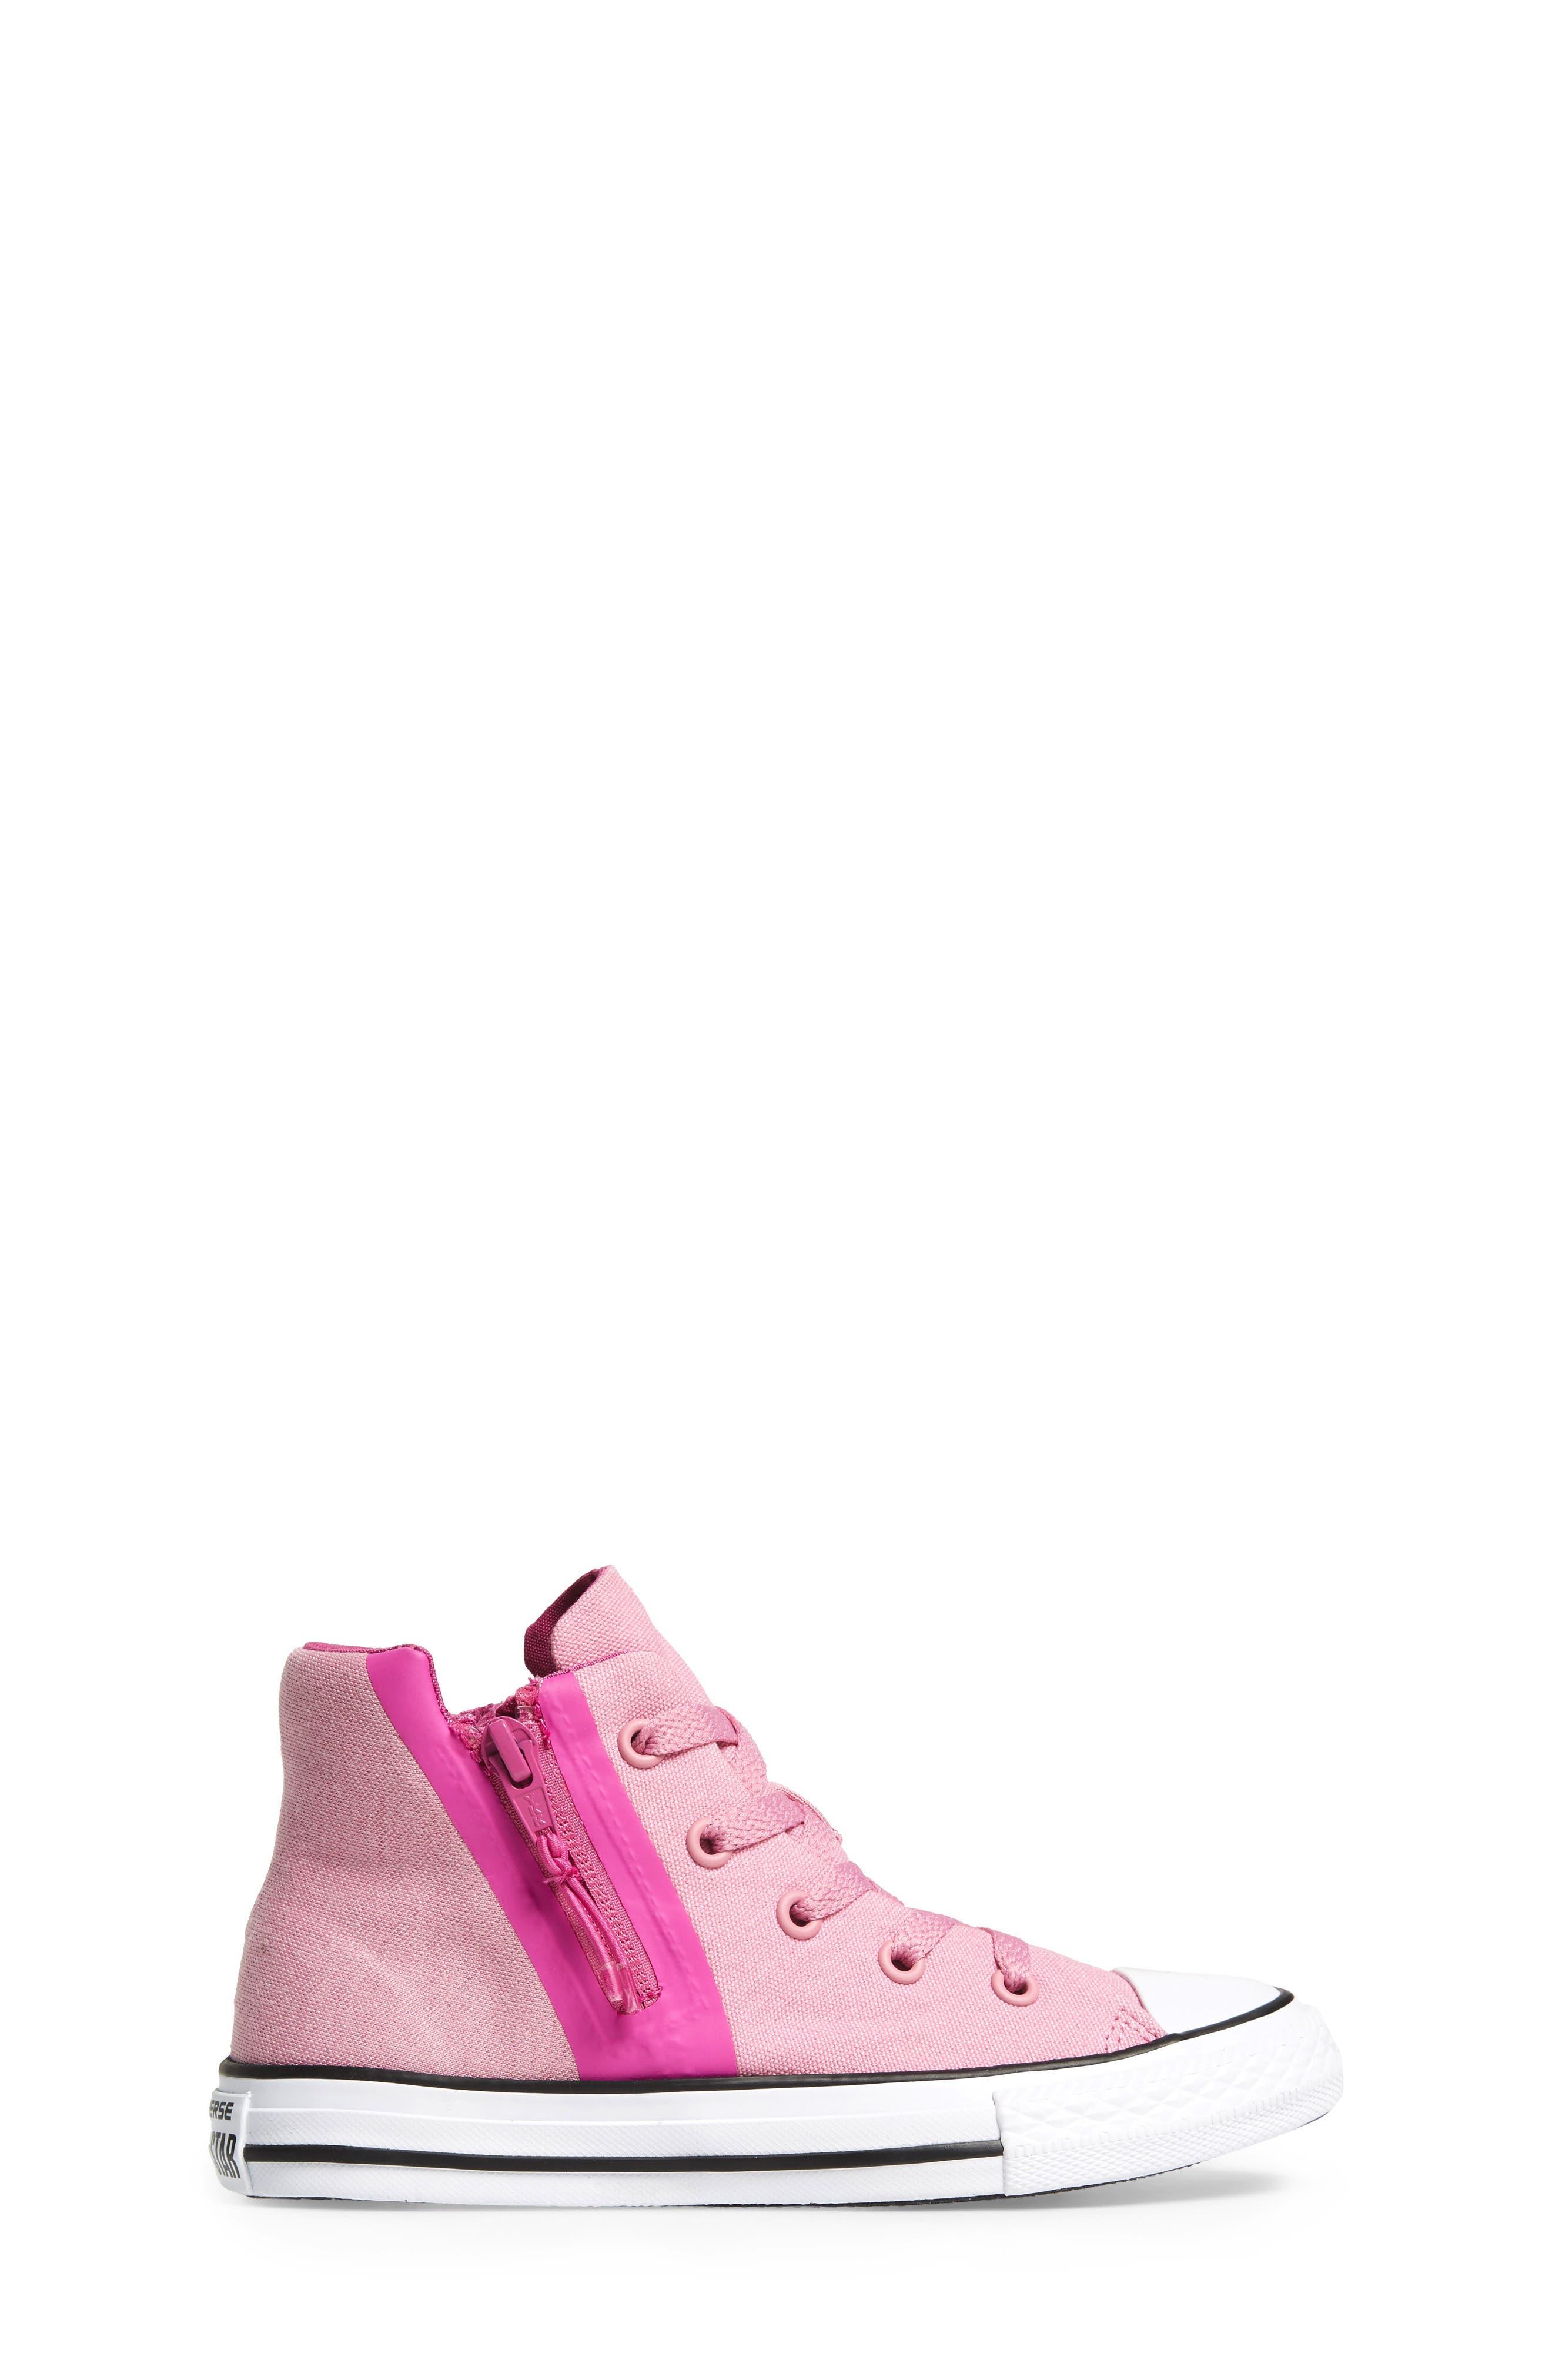 Alternate Image 3  - Converse Chuck Taylor® All Star® Sport Zip High Top Sneaker (Toddler, Little Kid & Big Kid)